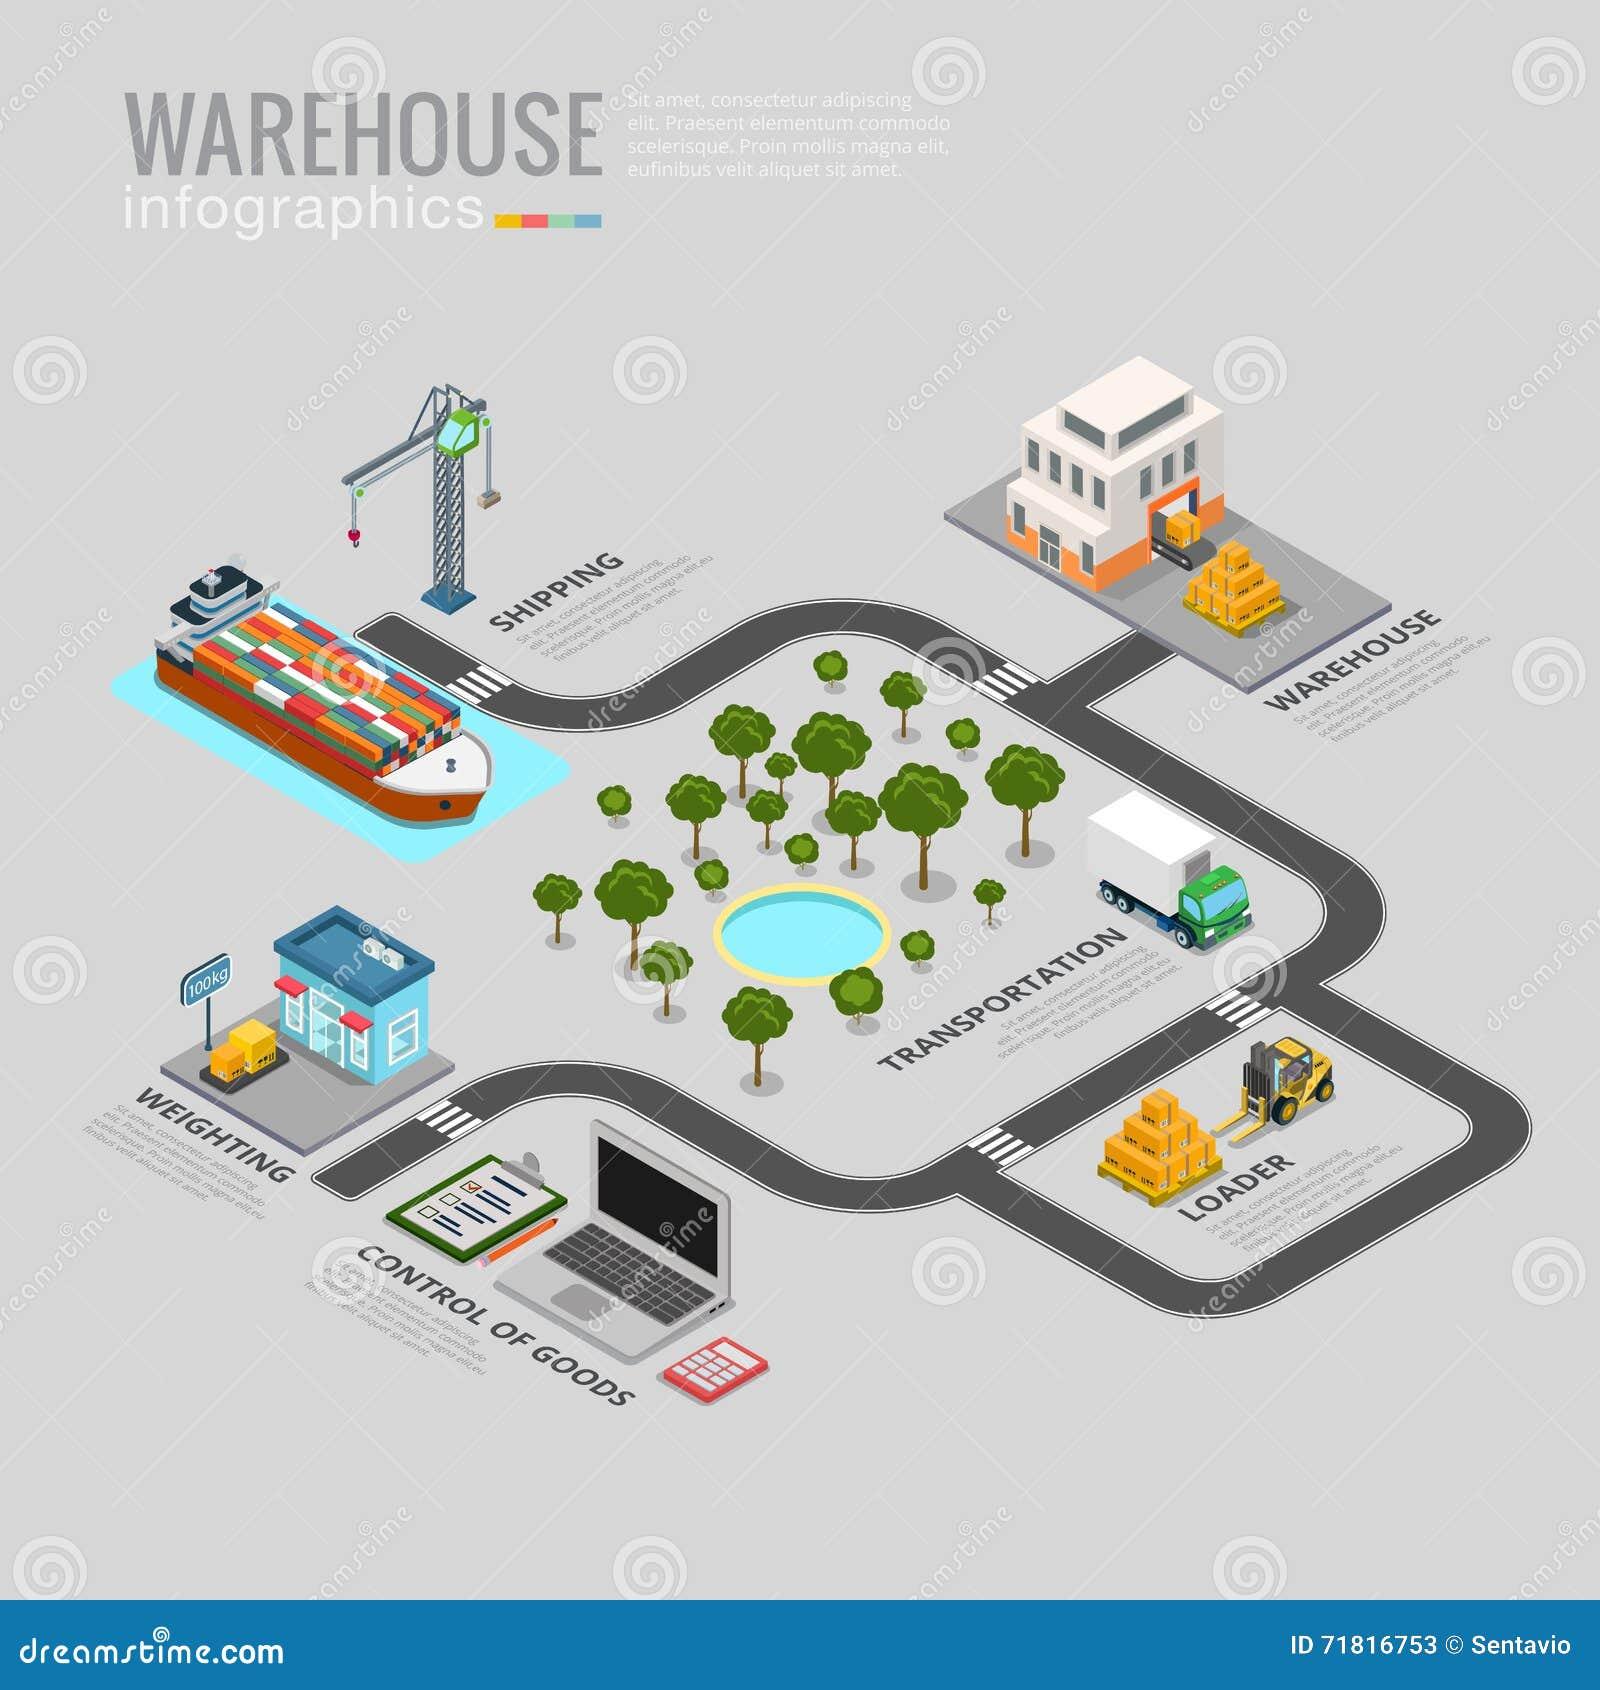 information logistics company